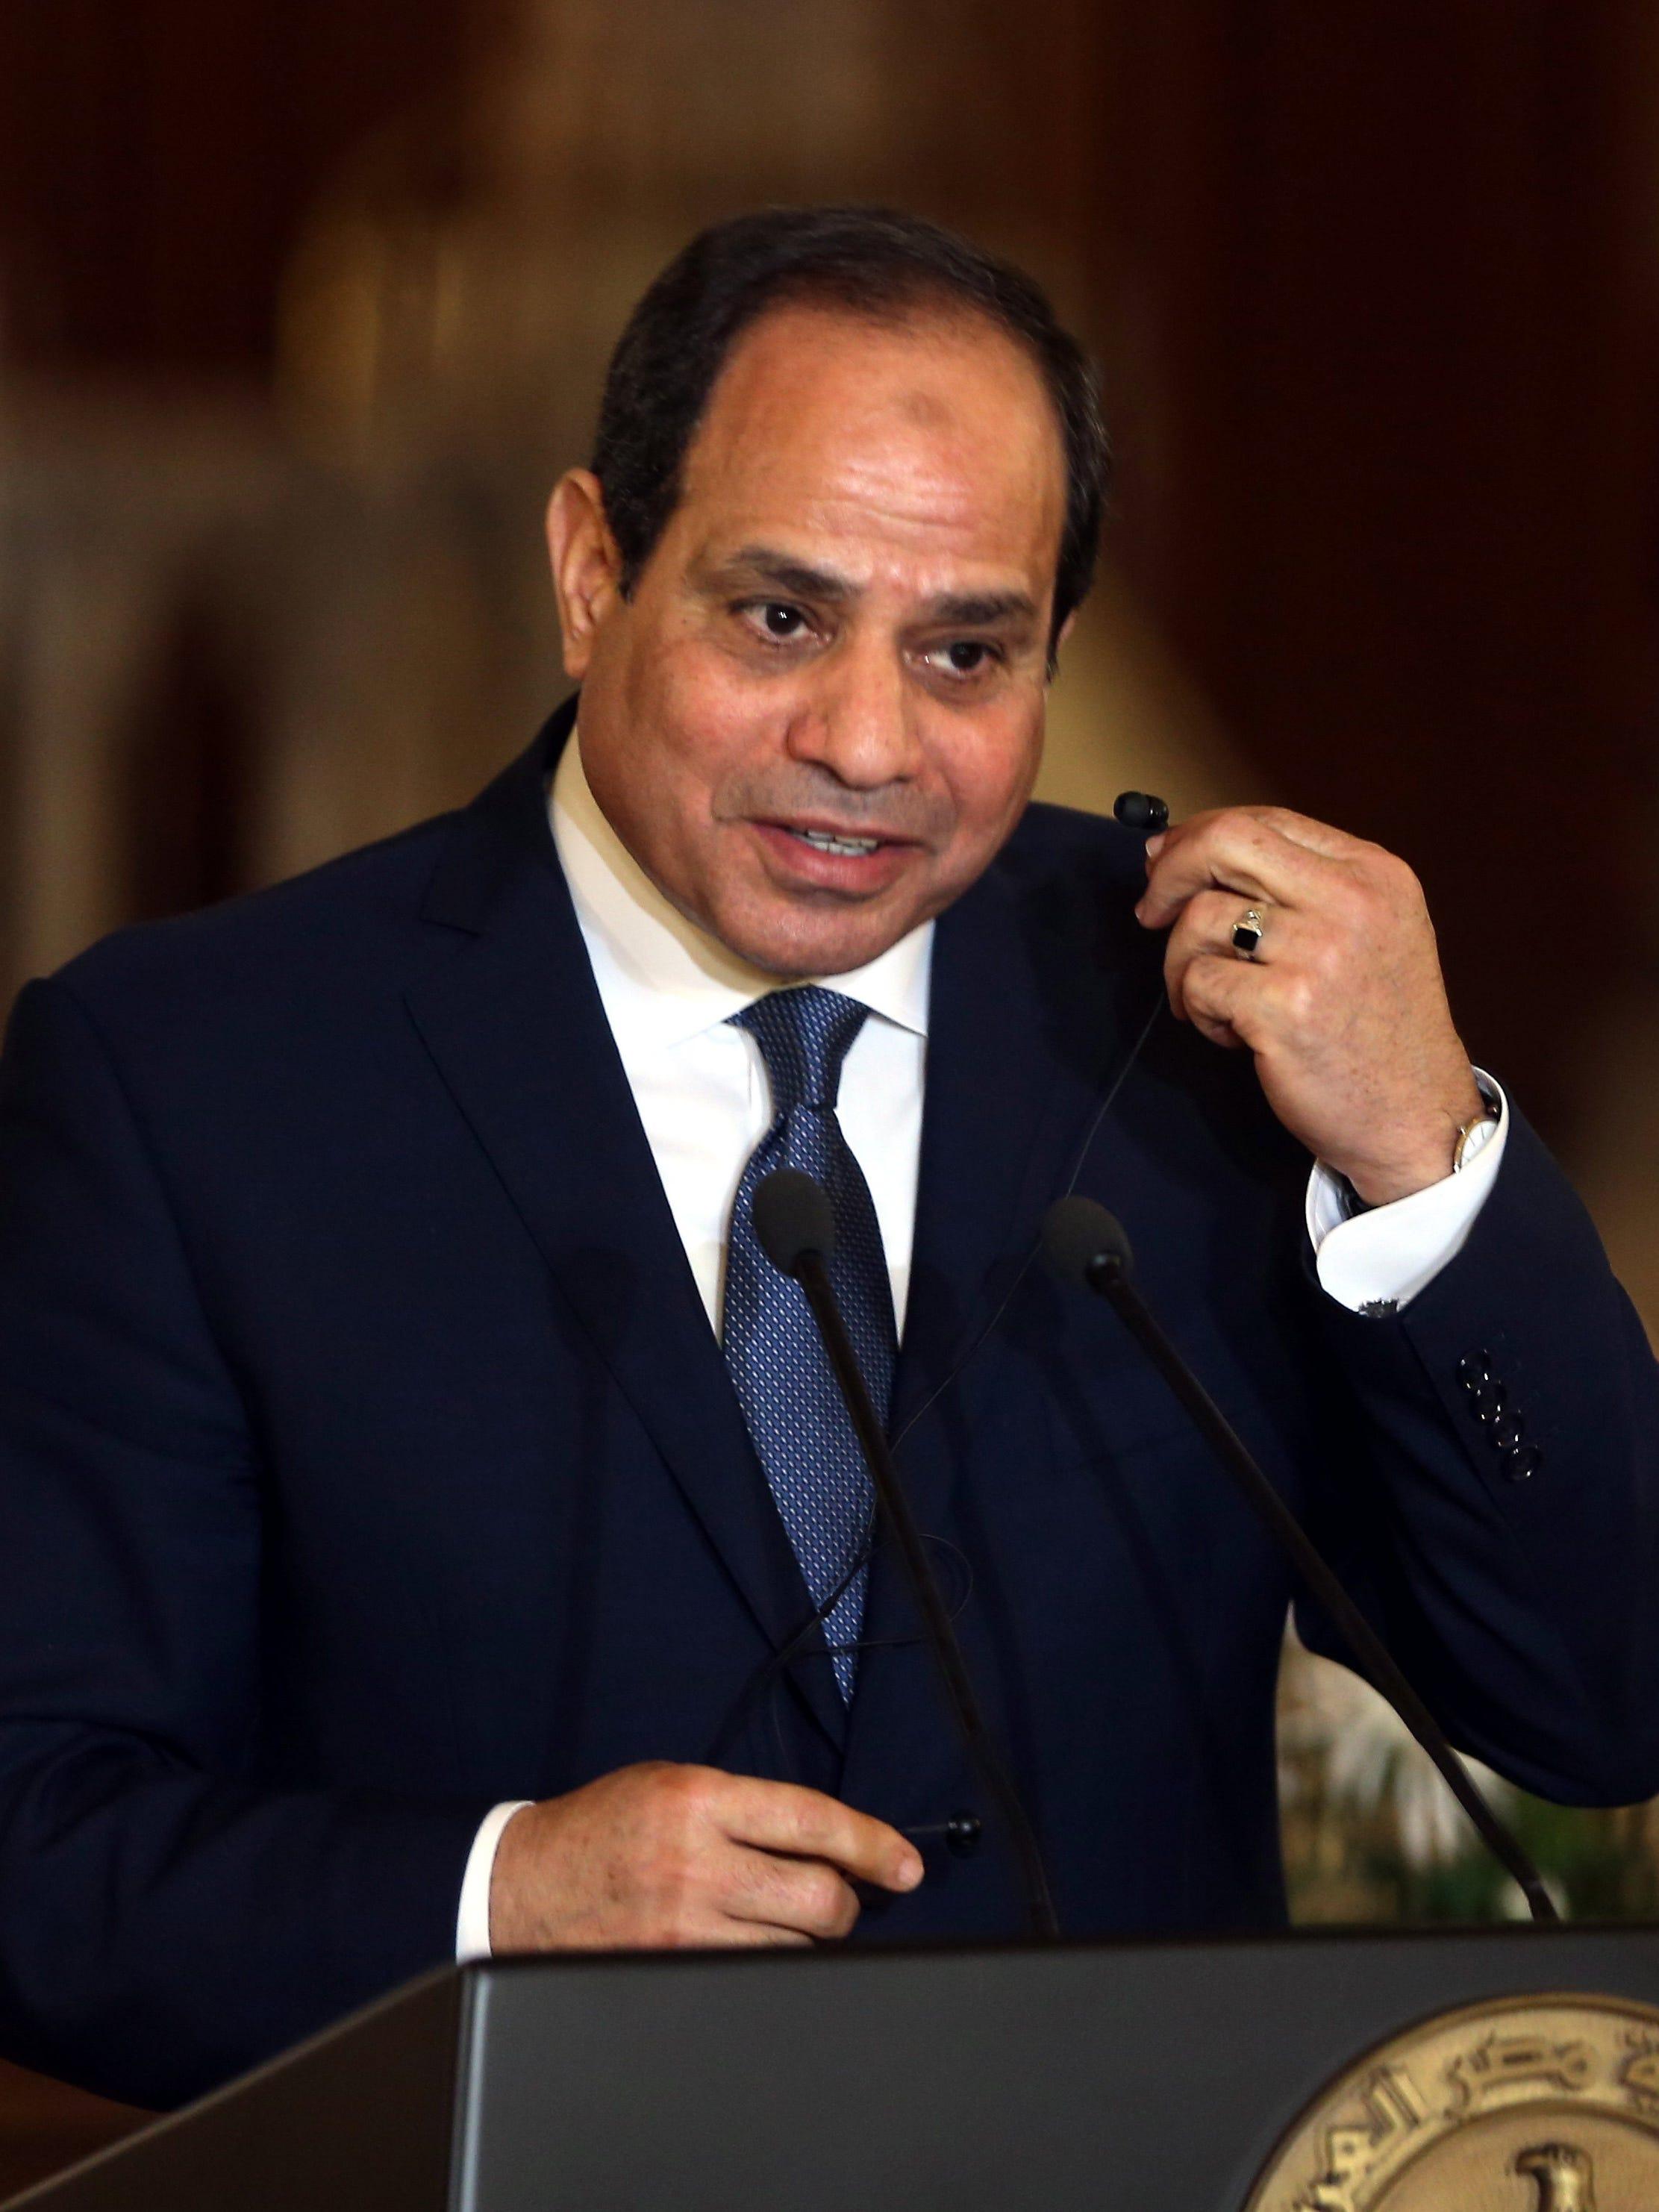 egyptian president abdel fattah el sisi